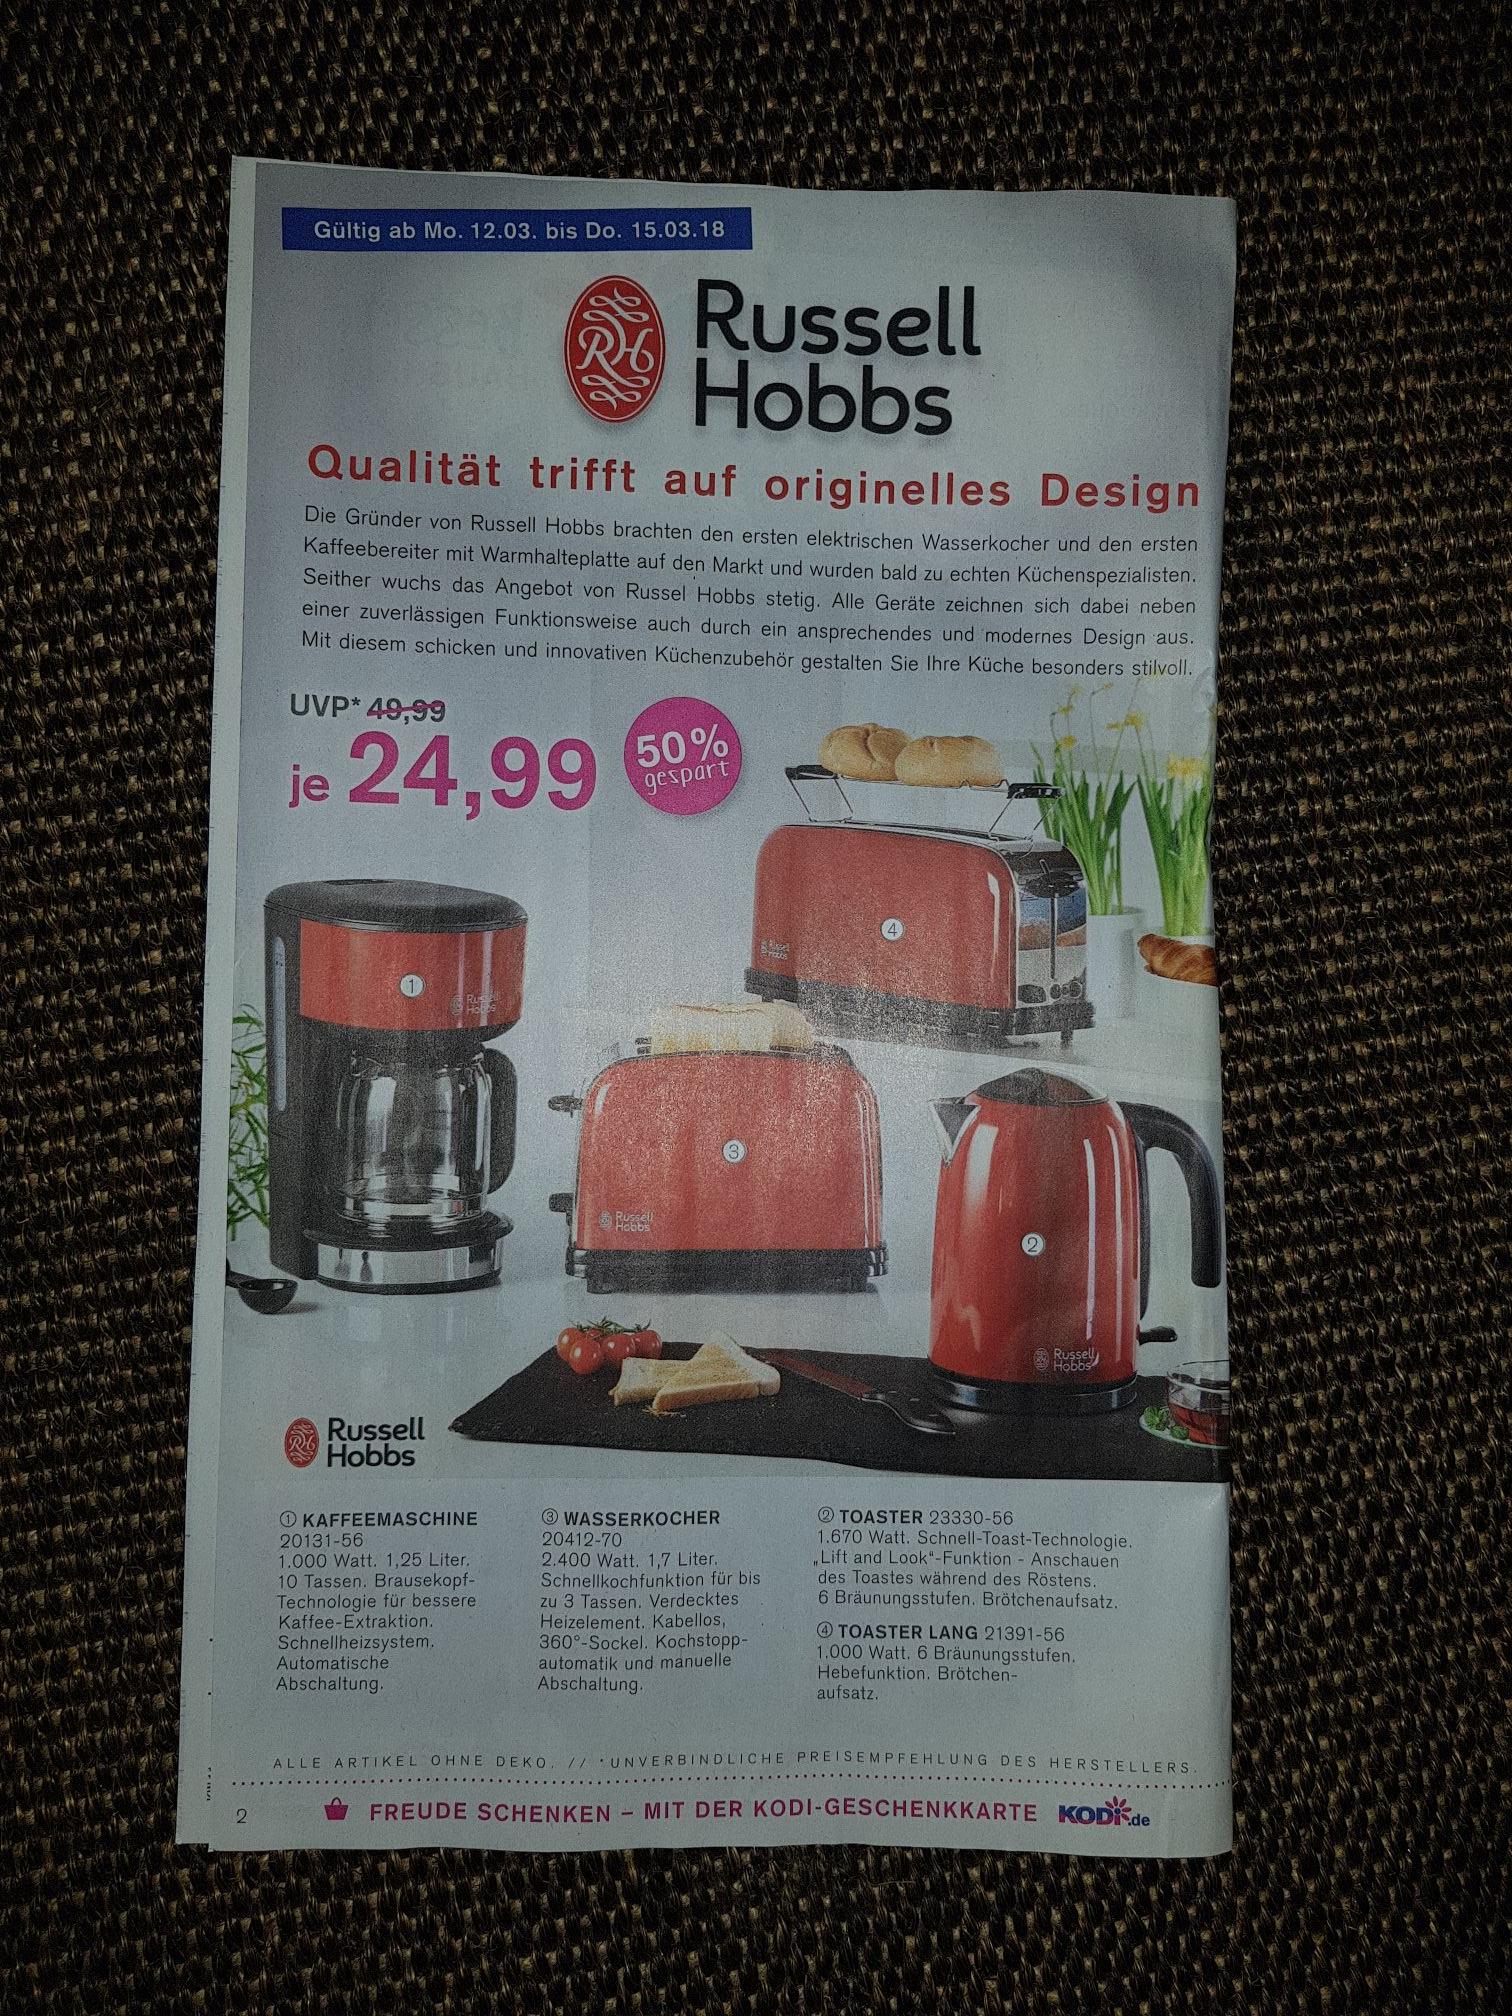 [KODI+online] Russell Hobbs Wasserkocher, Toaster, Kaffeemaschine